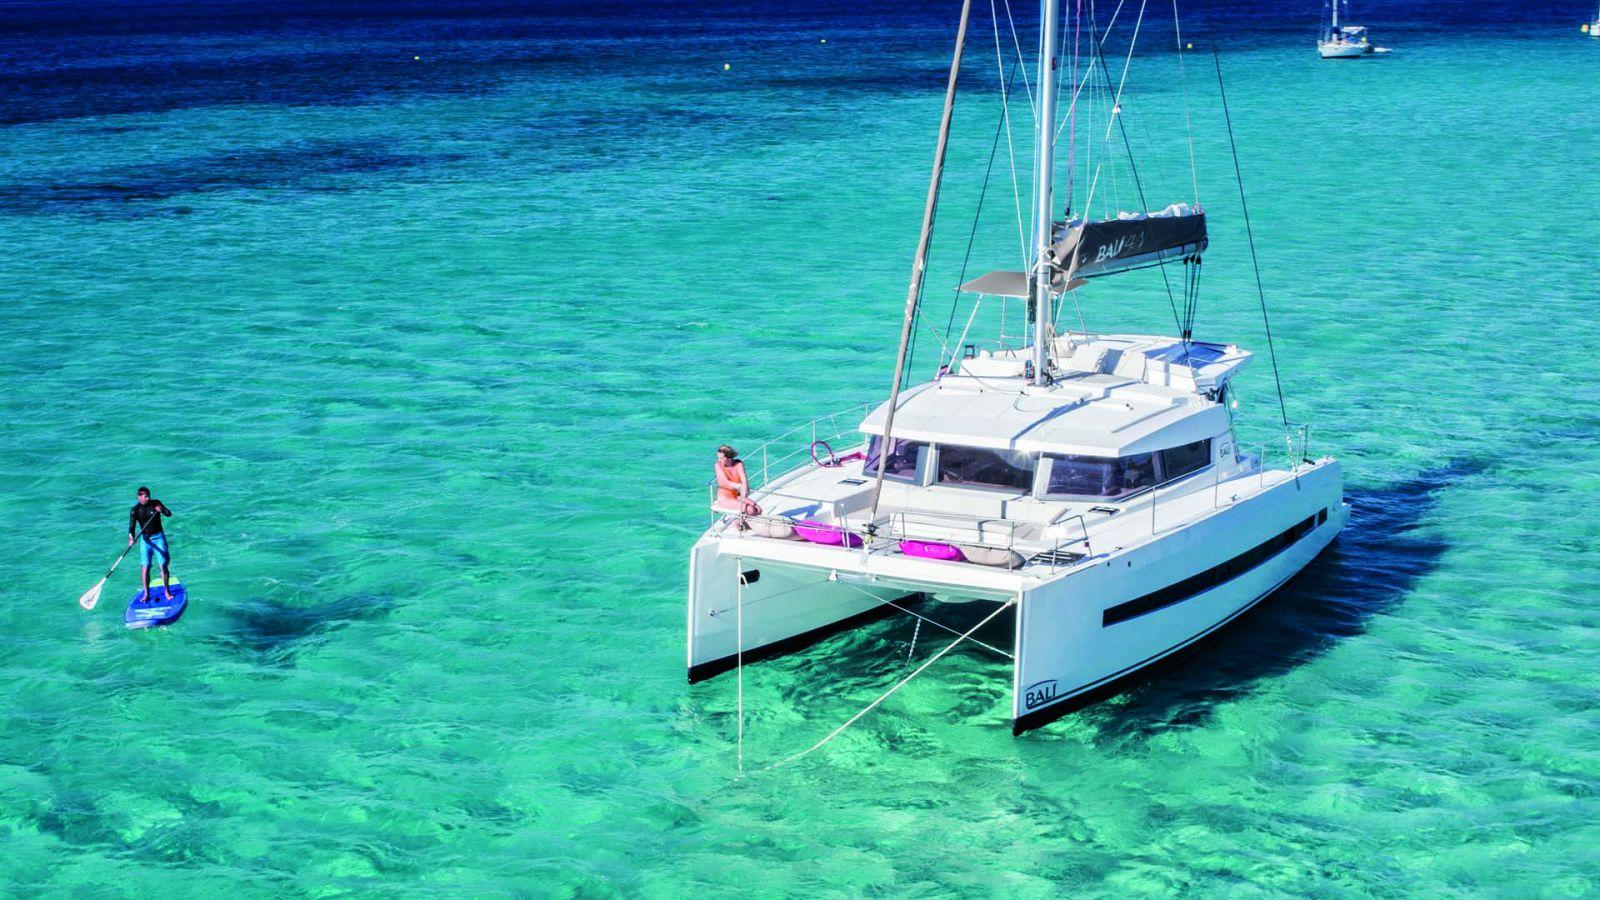 Bali 4.1 sailing catamaran